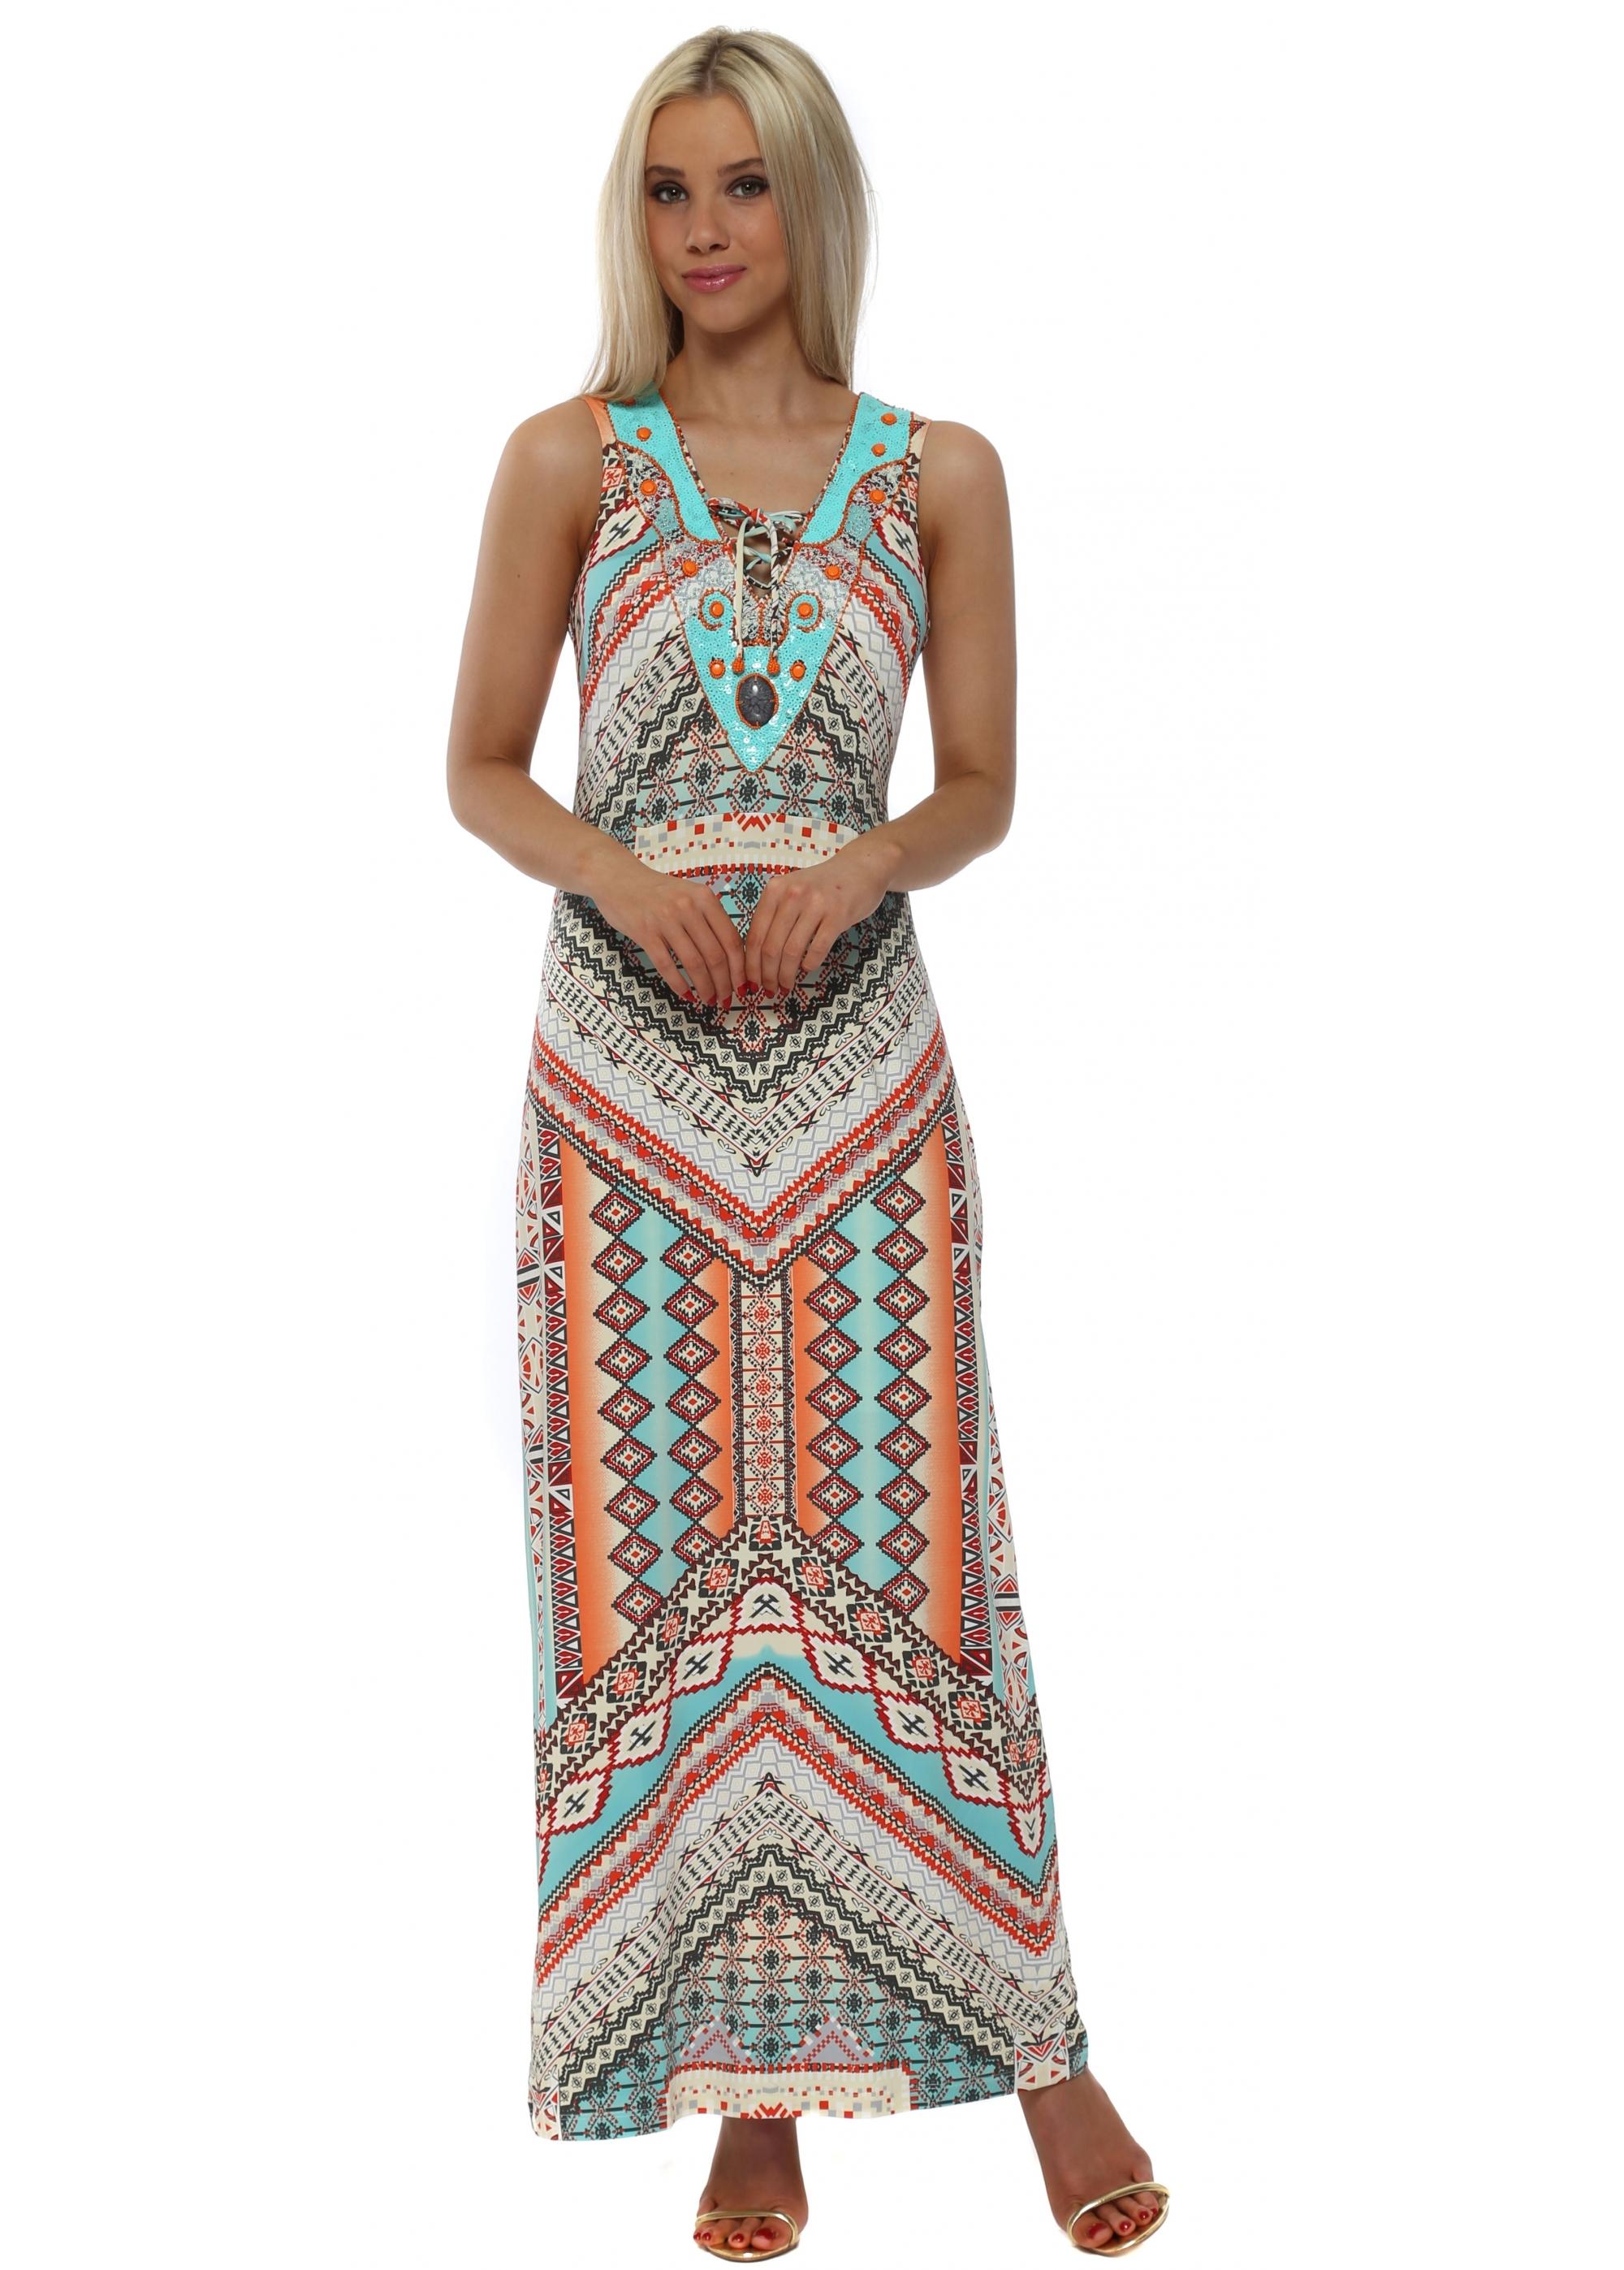 Maxi Jurk Turquoise.K Design Dress J877 Multicoloured Sequinned Maxi